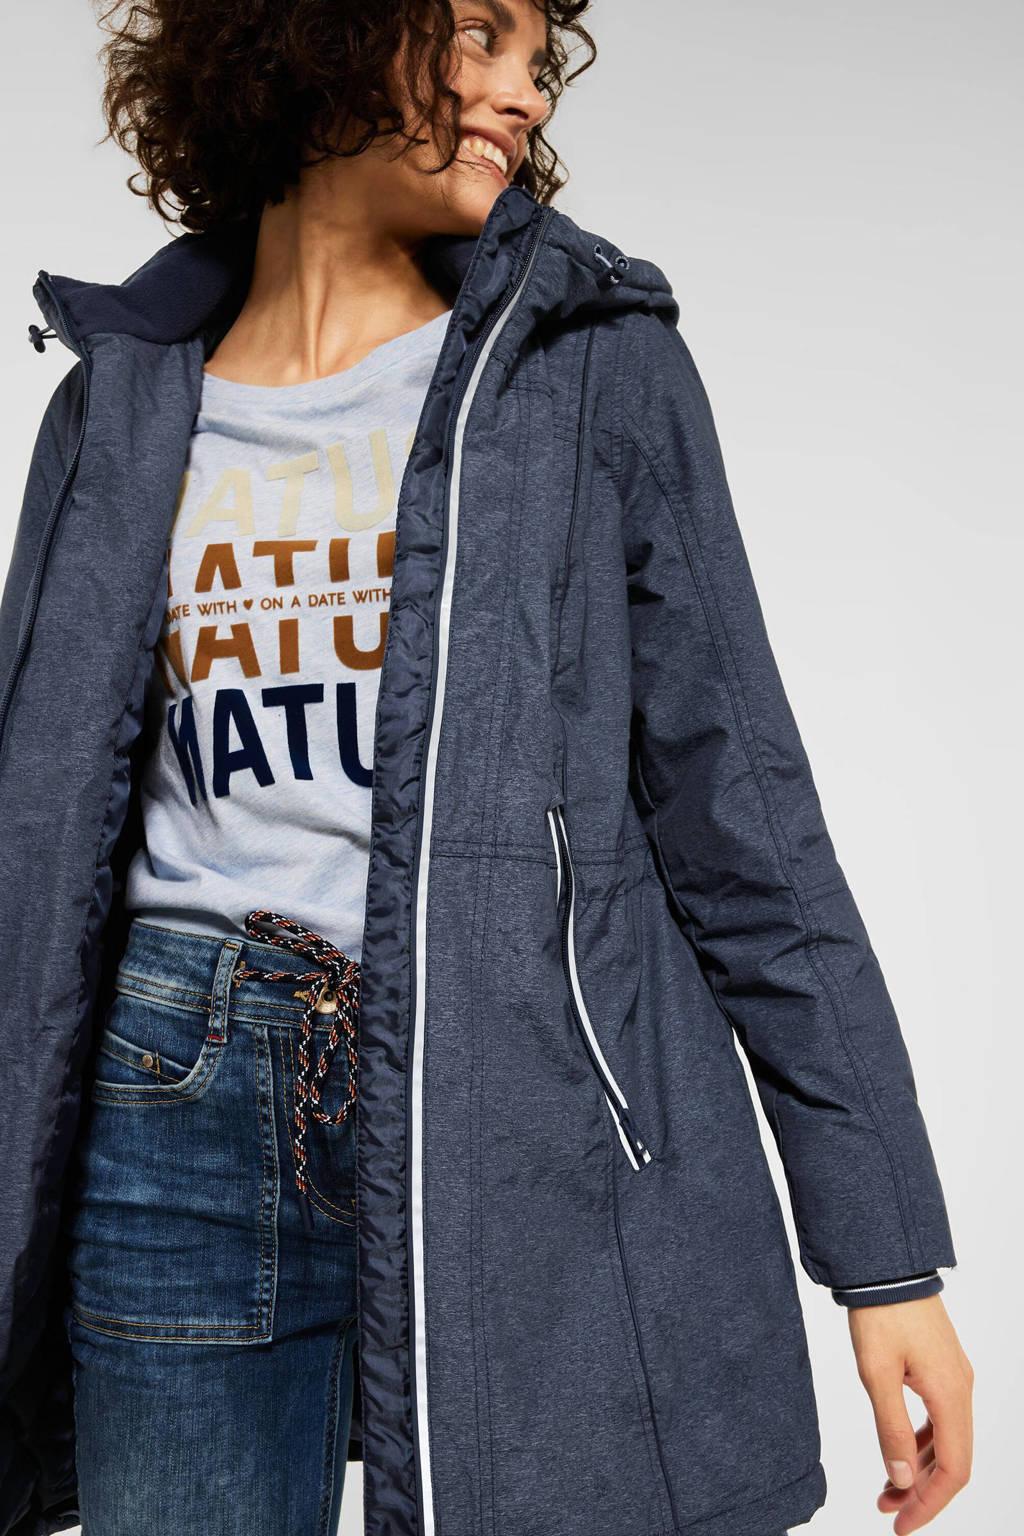 CECIL gemêleerde gewatteerde jas donkerblauw/wit, Donkerblauw/wit